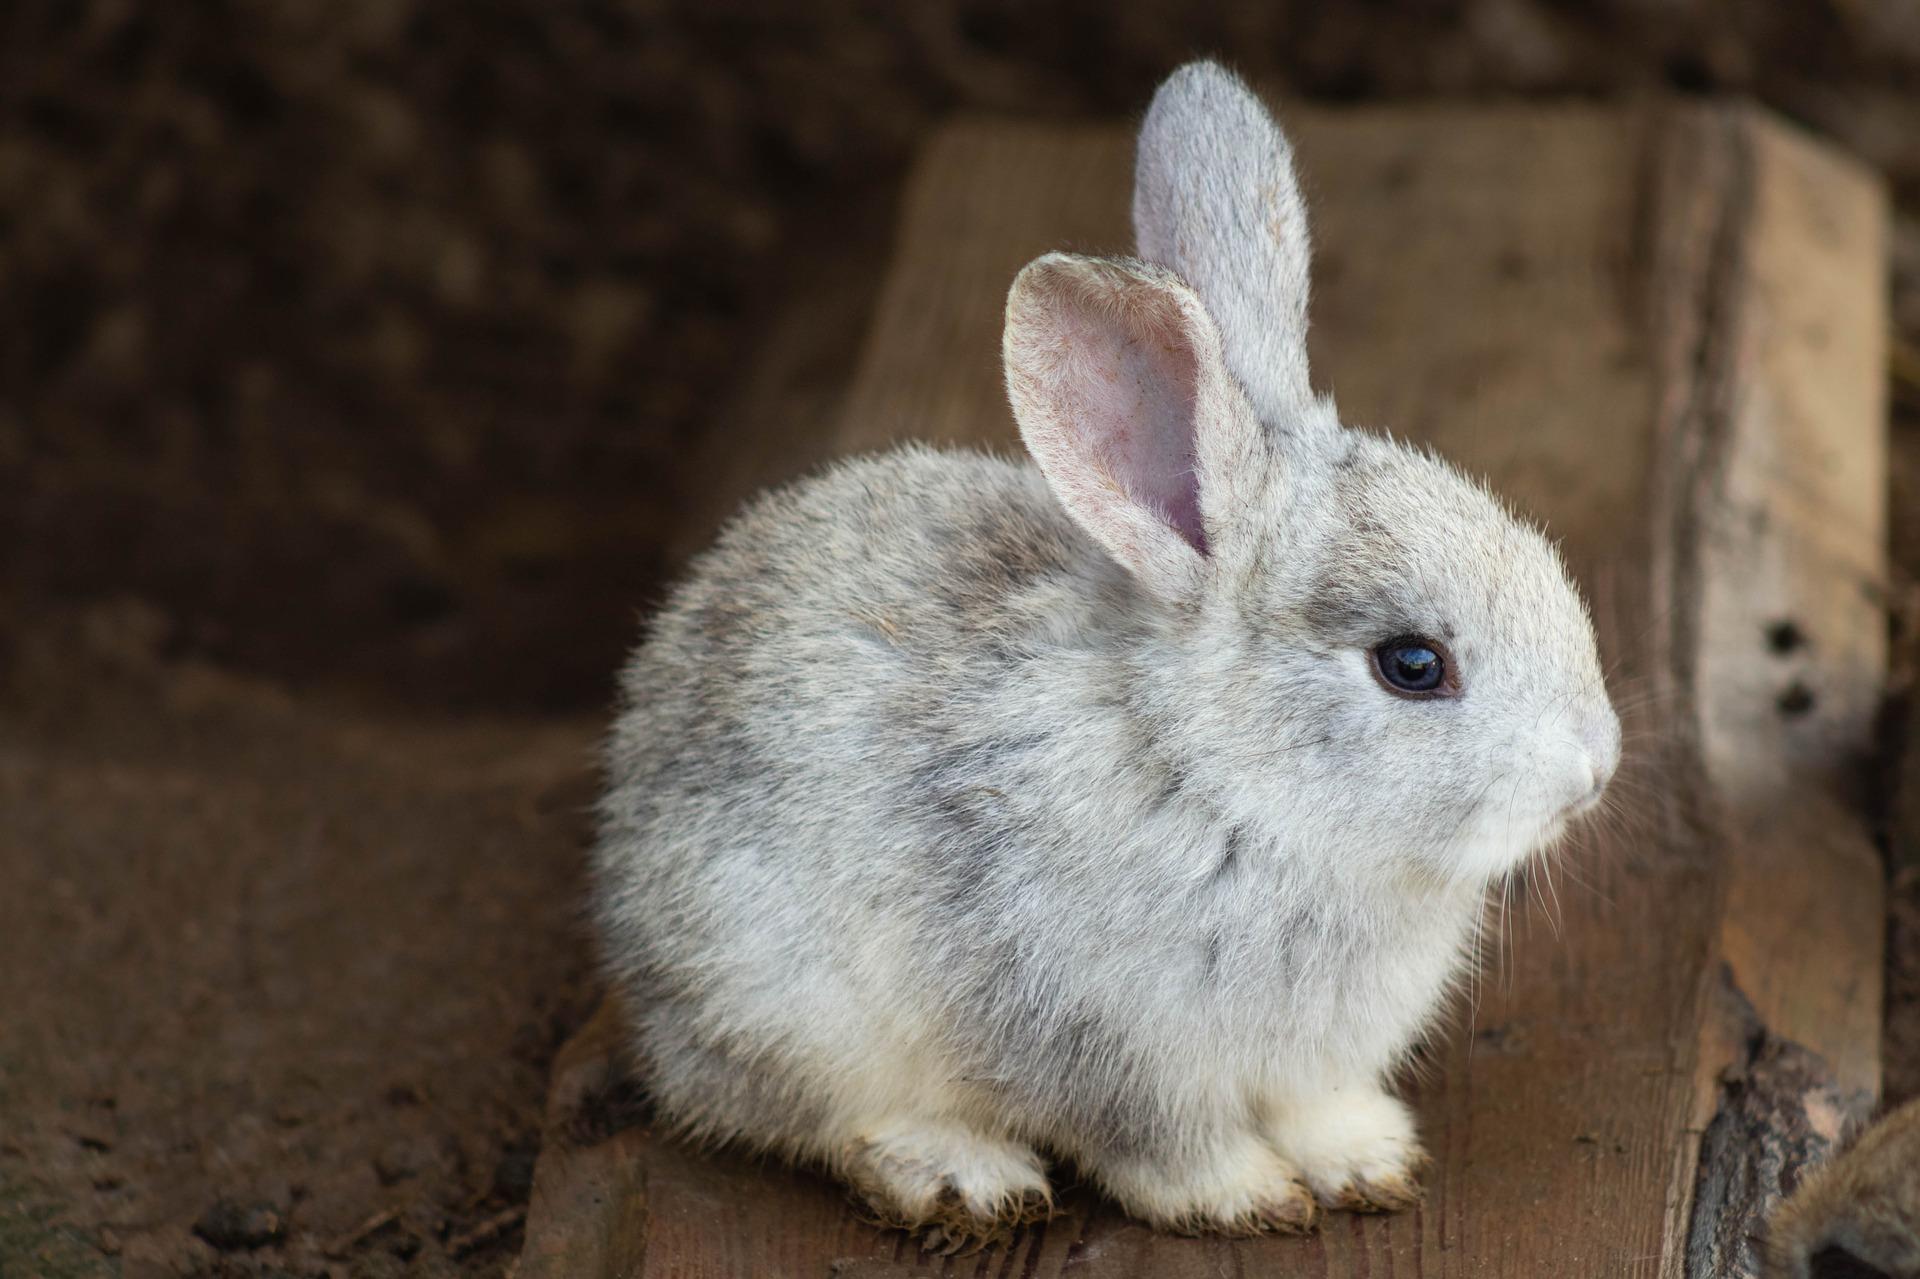 rabbit-3578422_1920.jpg